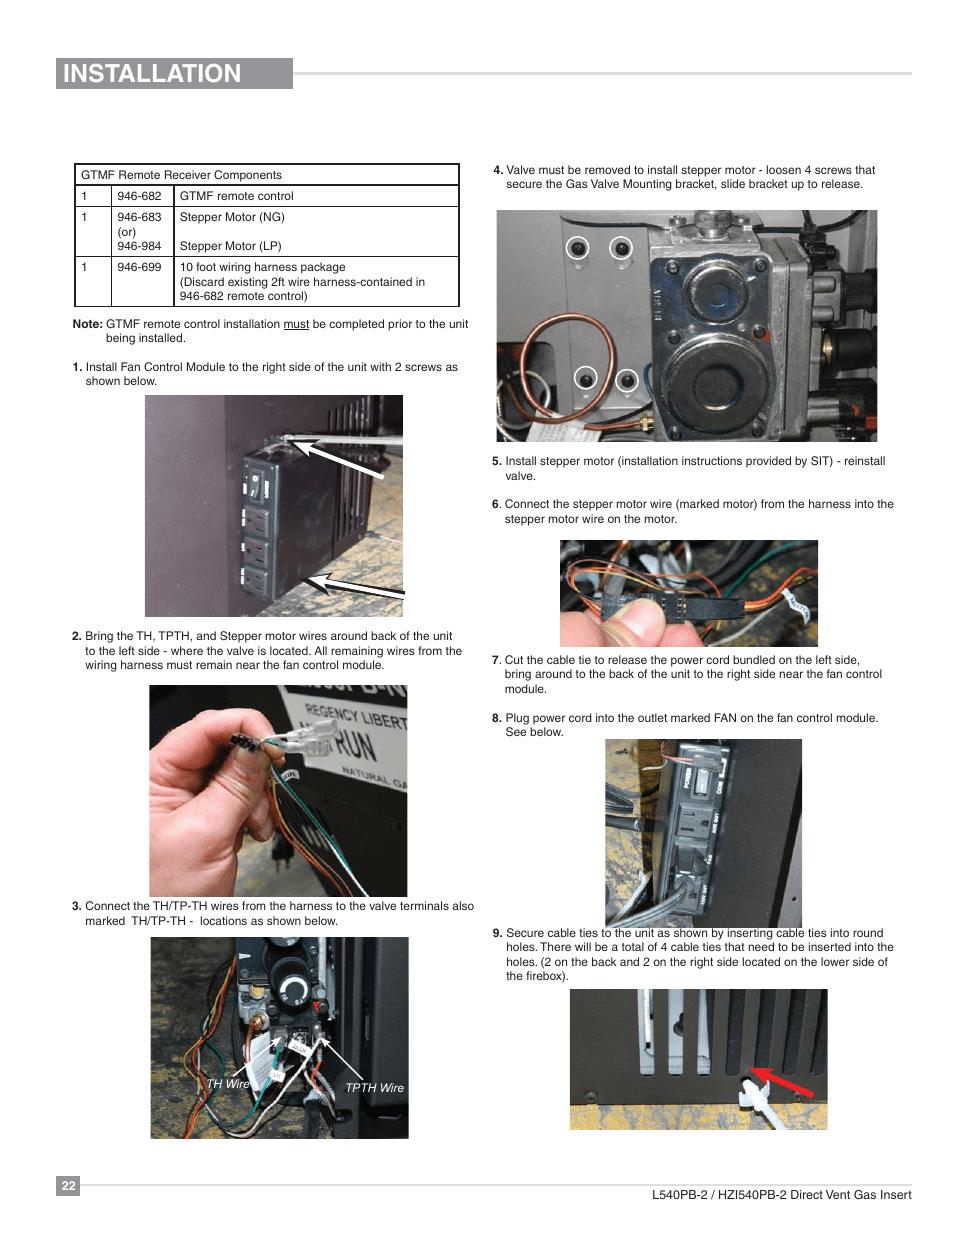 hight resolution of installation gtmf remote control installation regency horizon hzi540pb large gas insert user manual page 22 56